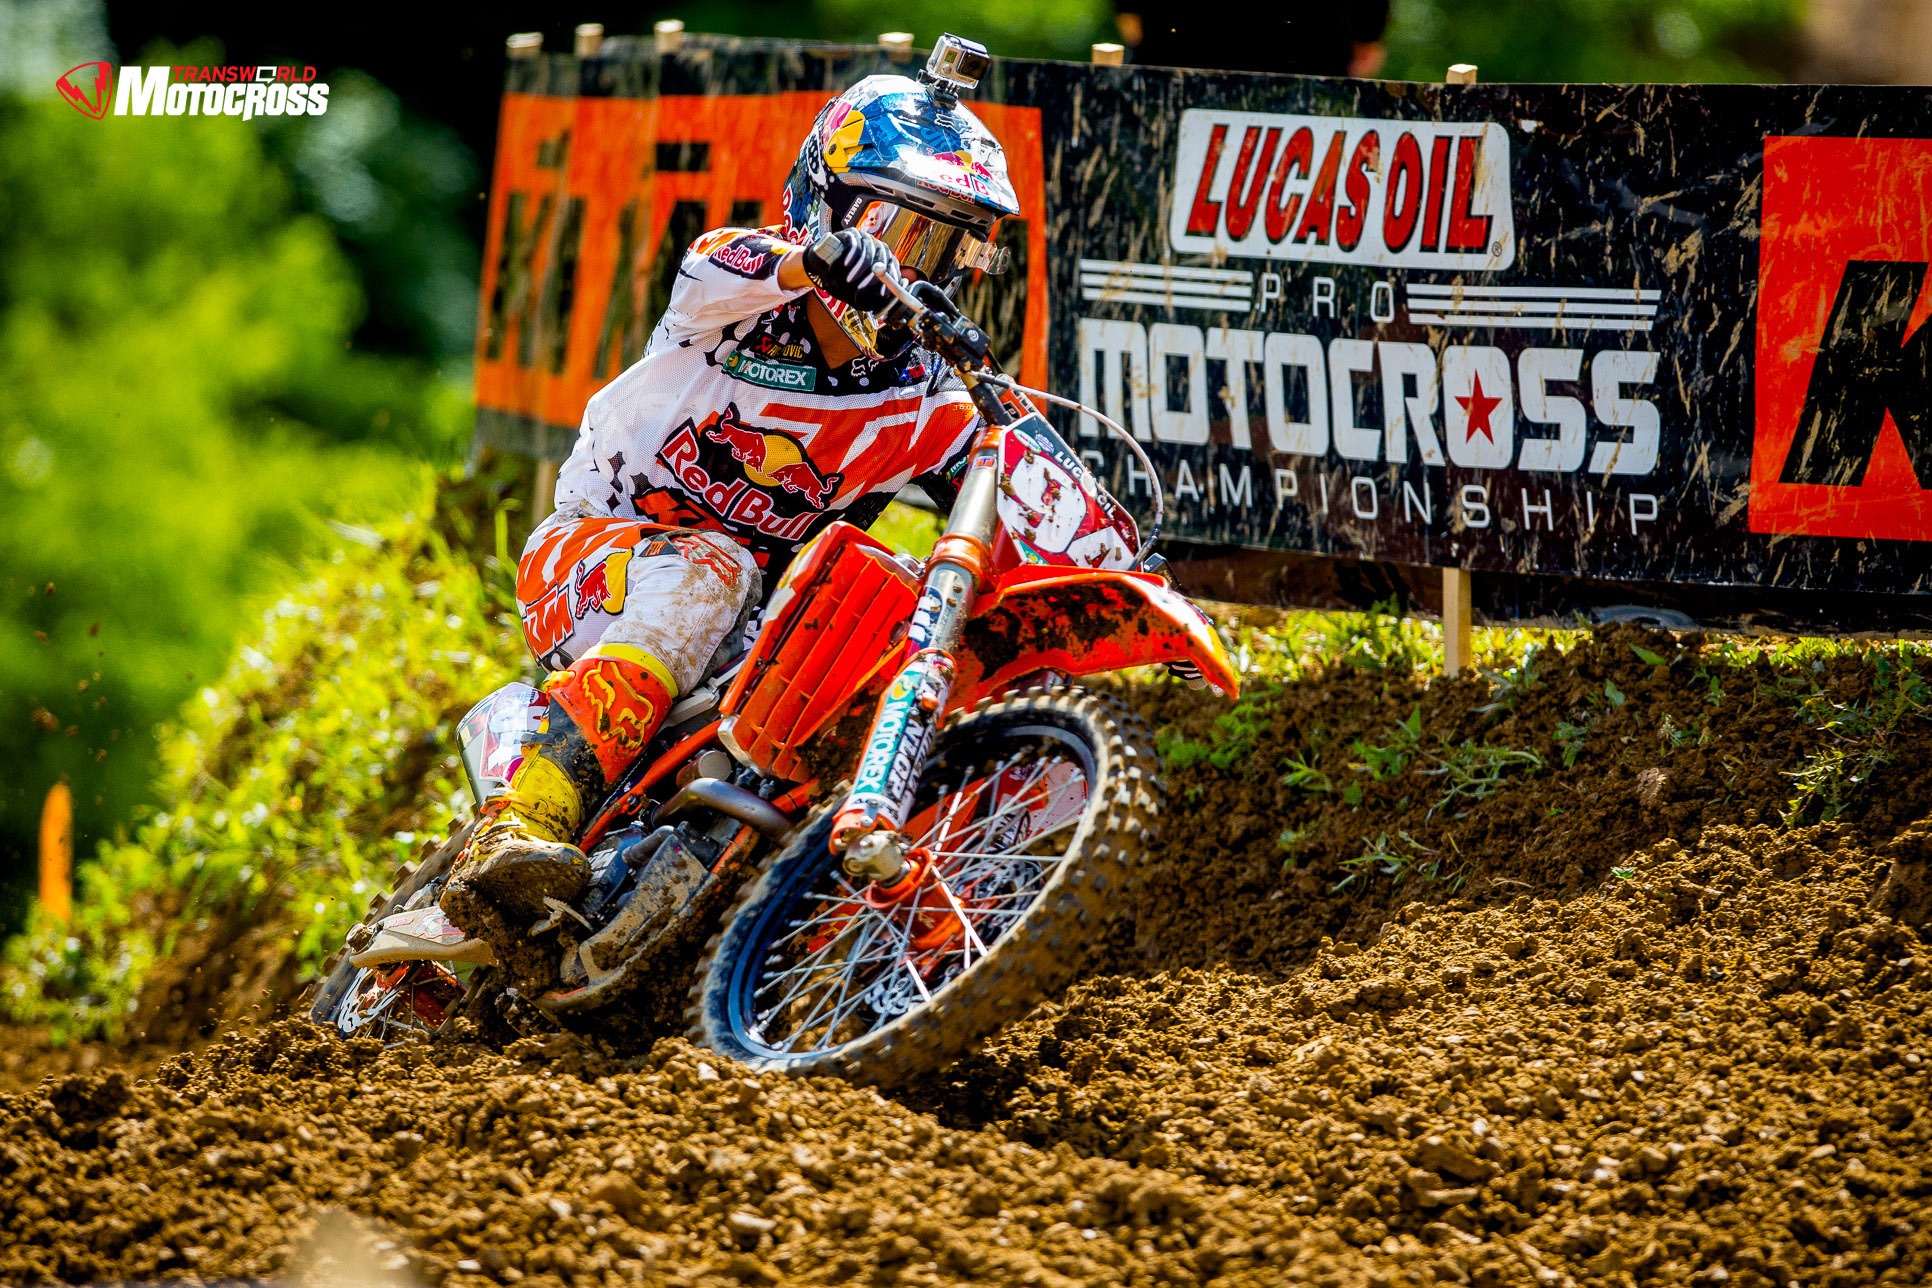 2014 High Point MX Wallpapers Transworld Motocross 1932x1288